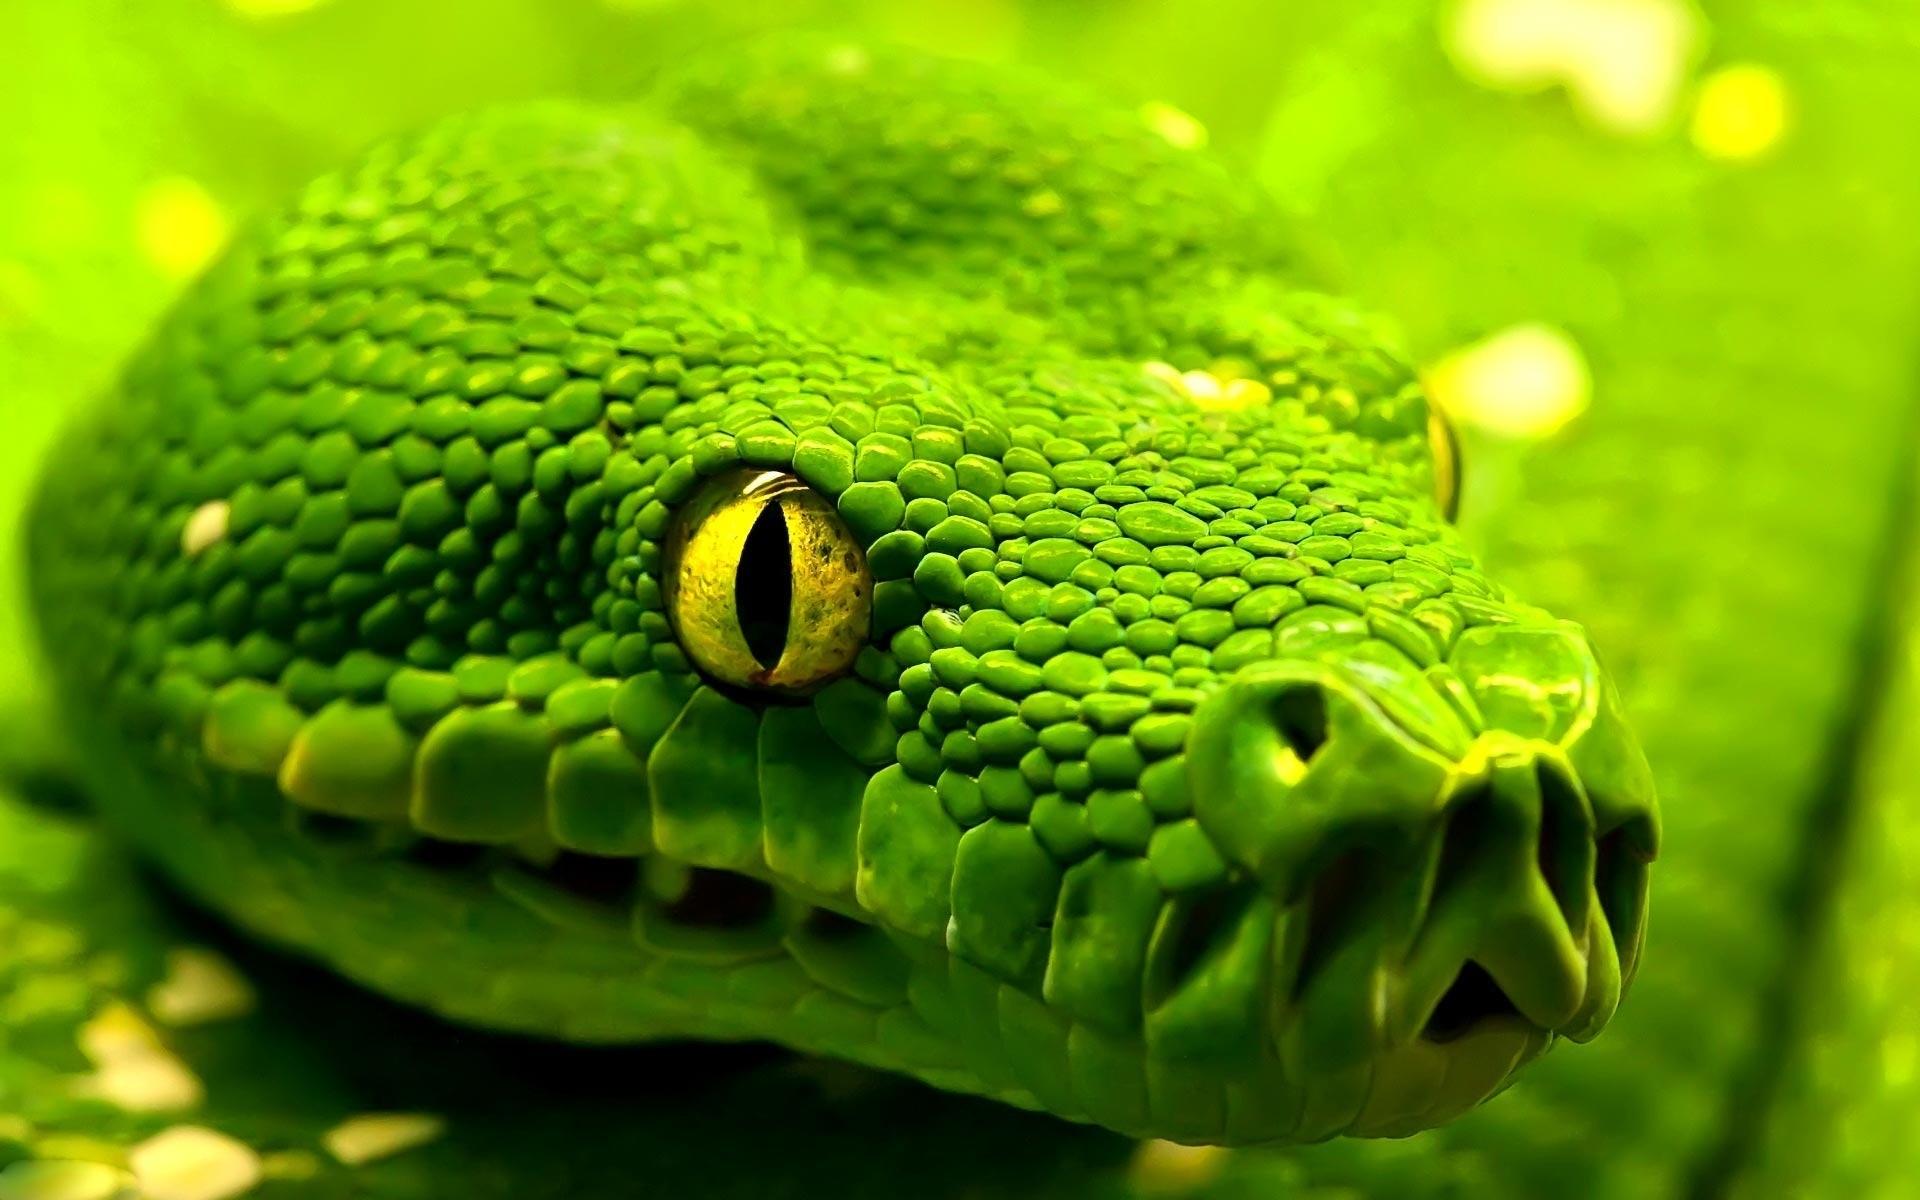 1920x1080 Green Dari Snake